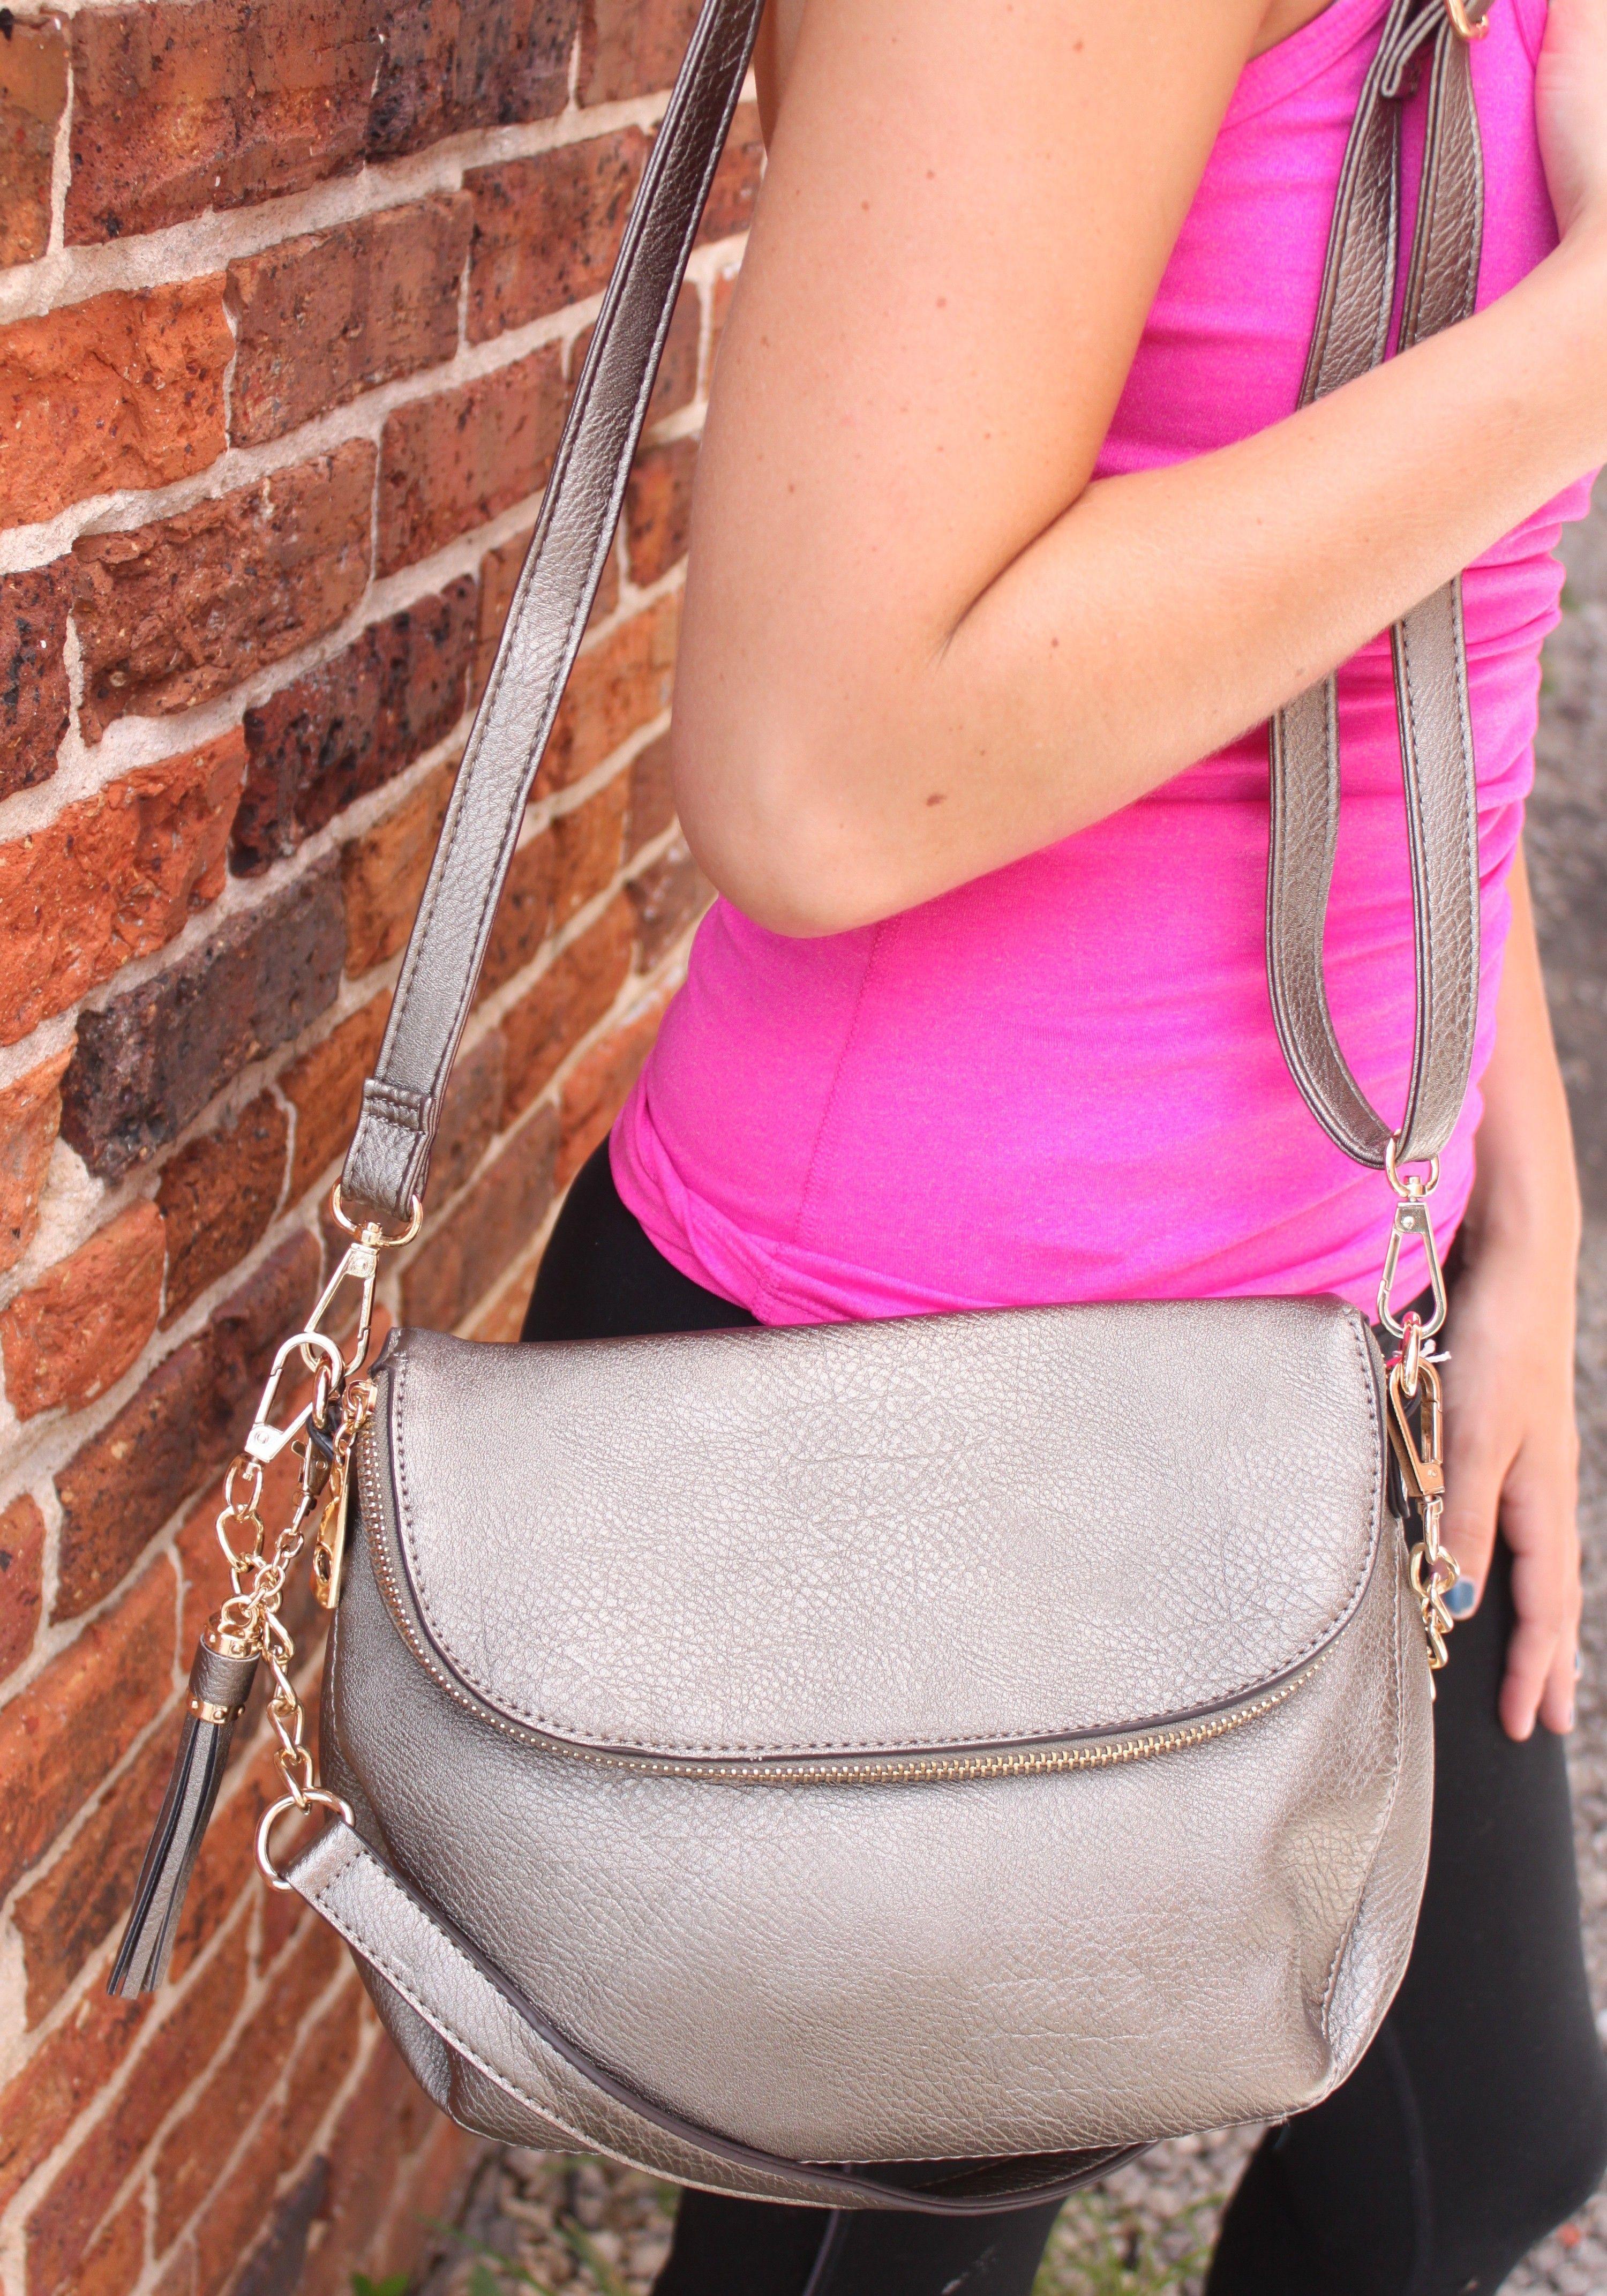 Jolie Fold Over Crossbody Bag (Includes Crossbody & Shoulder Strap) - Bronze